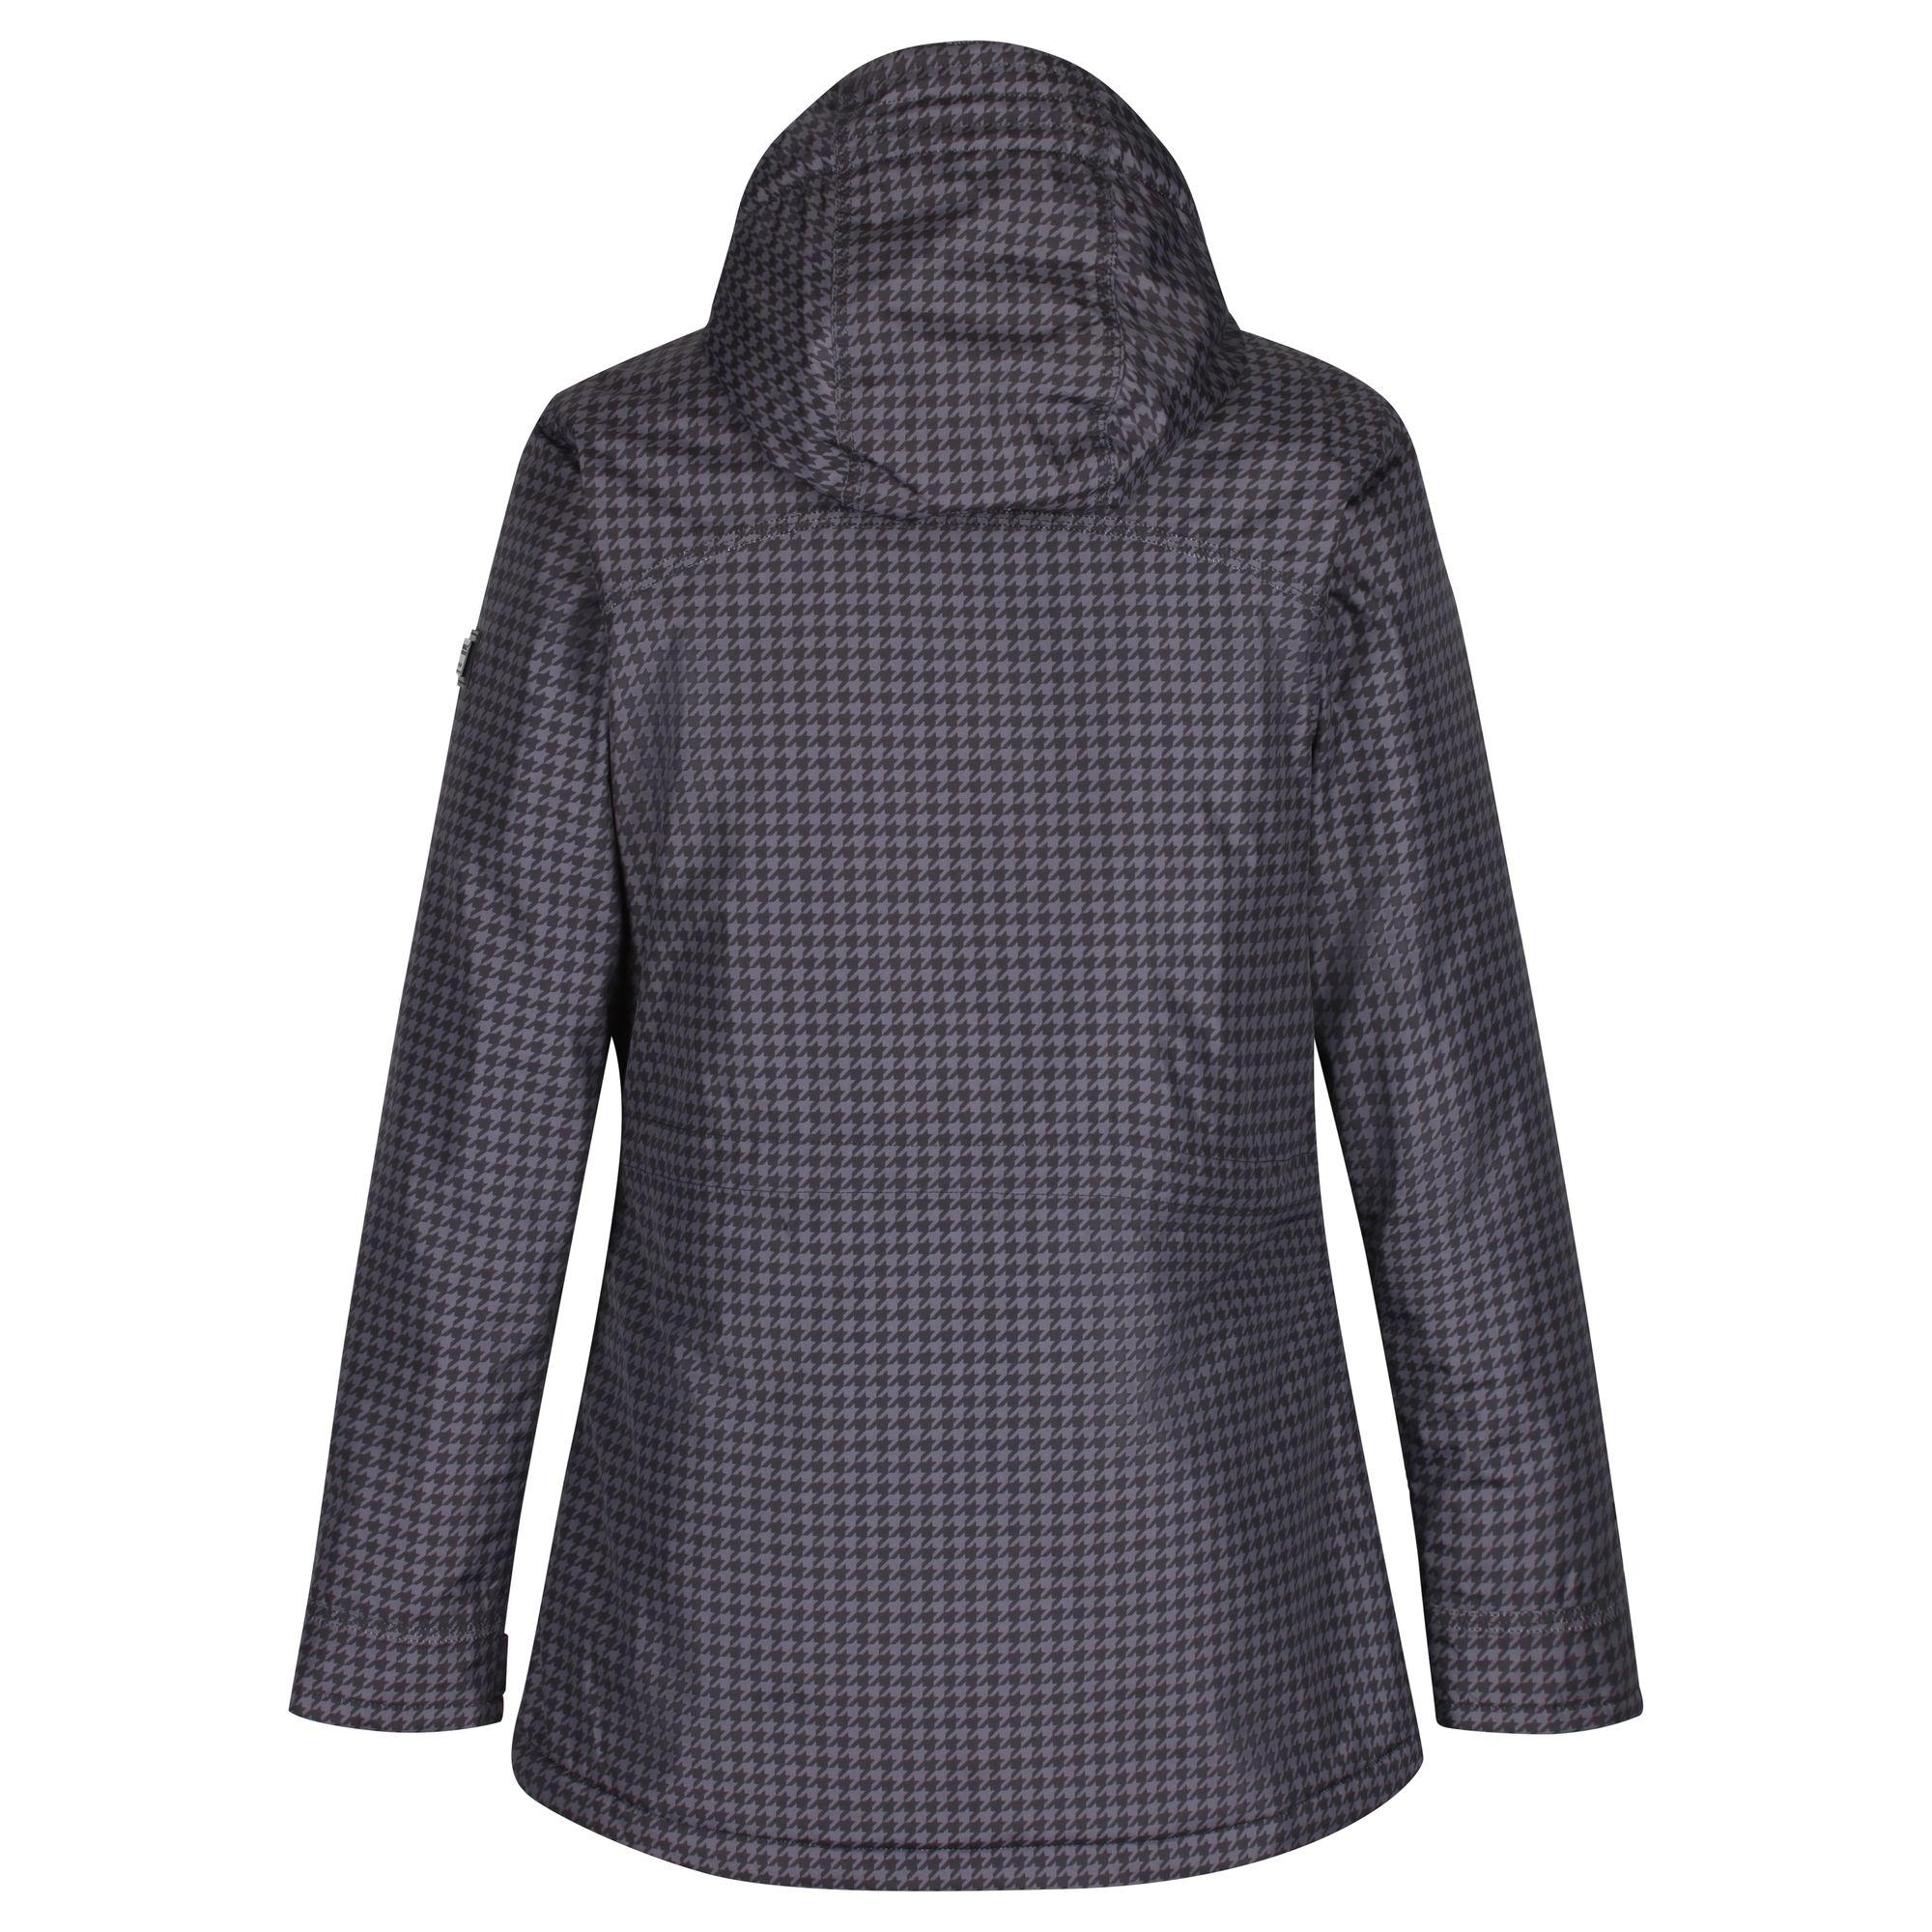 Regatta-Womens-Ladies-Braelynn-Long-Length-Waterproof-Jacket-RG4552 thumbnail 4